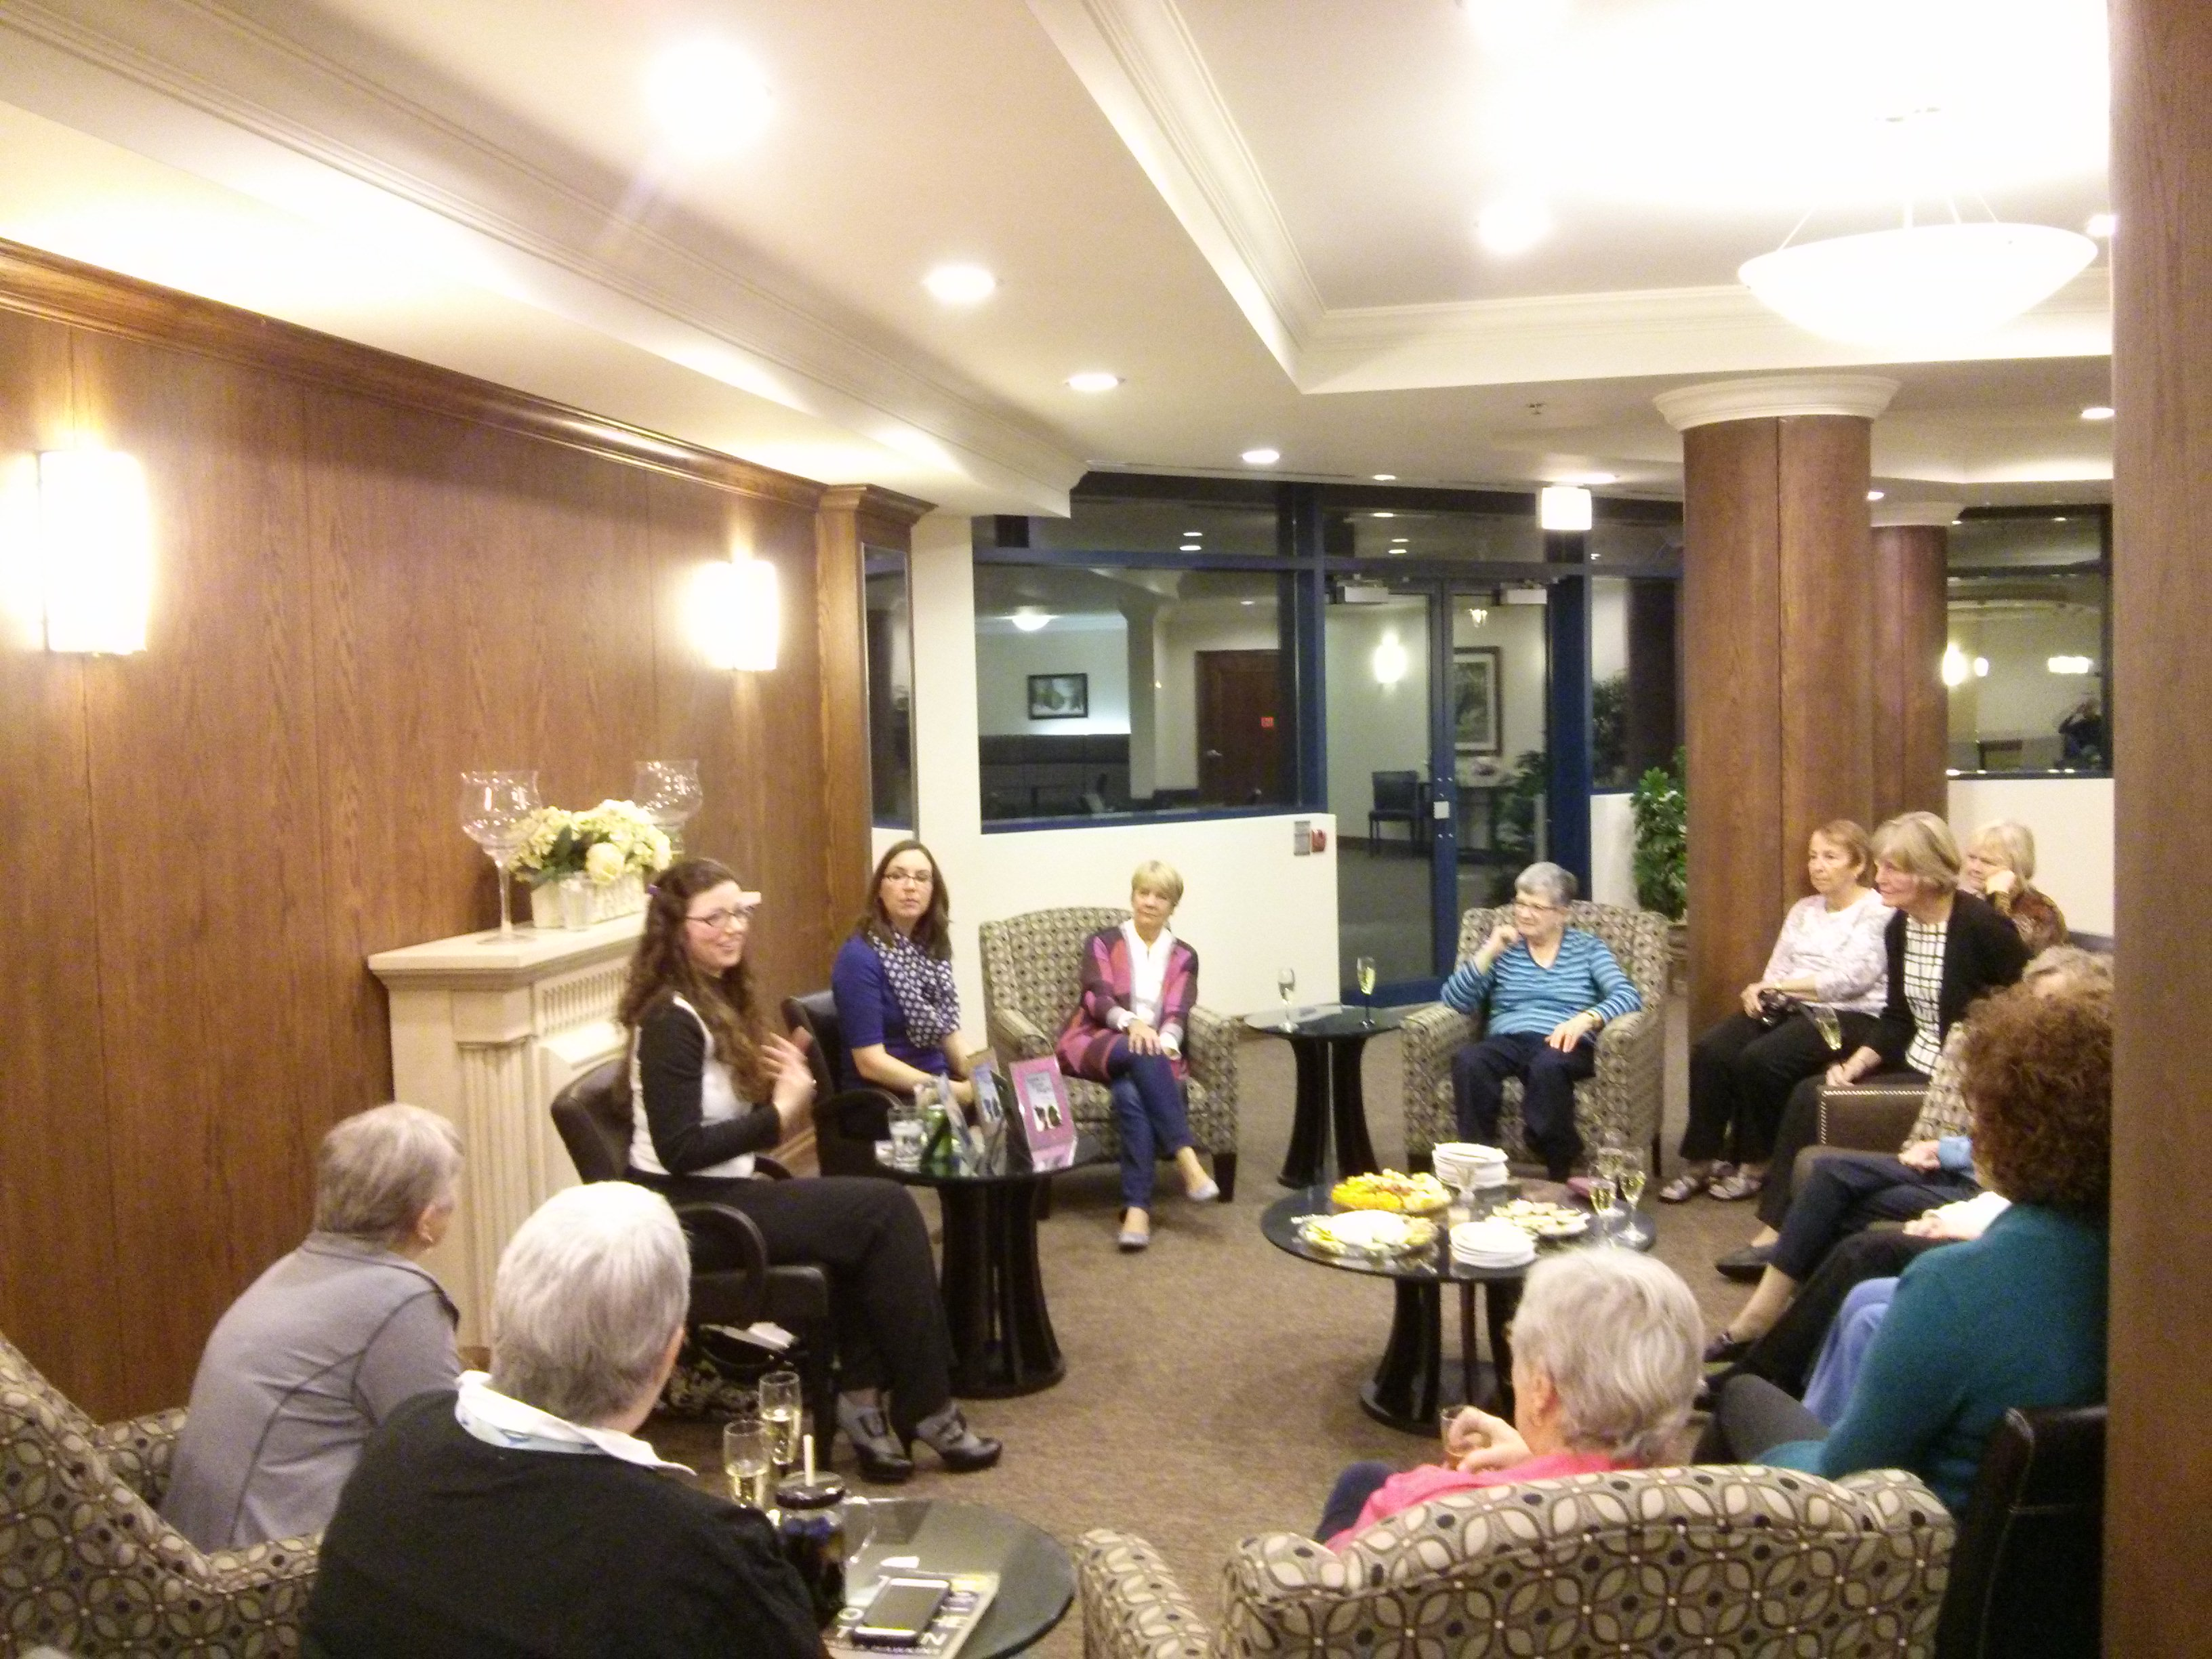 Nautica Book Club - Nov 11, 2015 (group discussion)